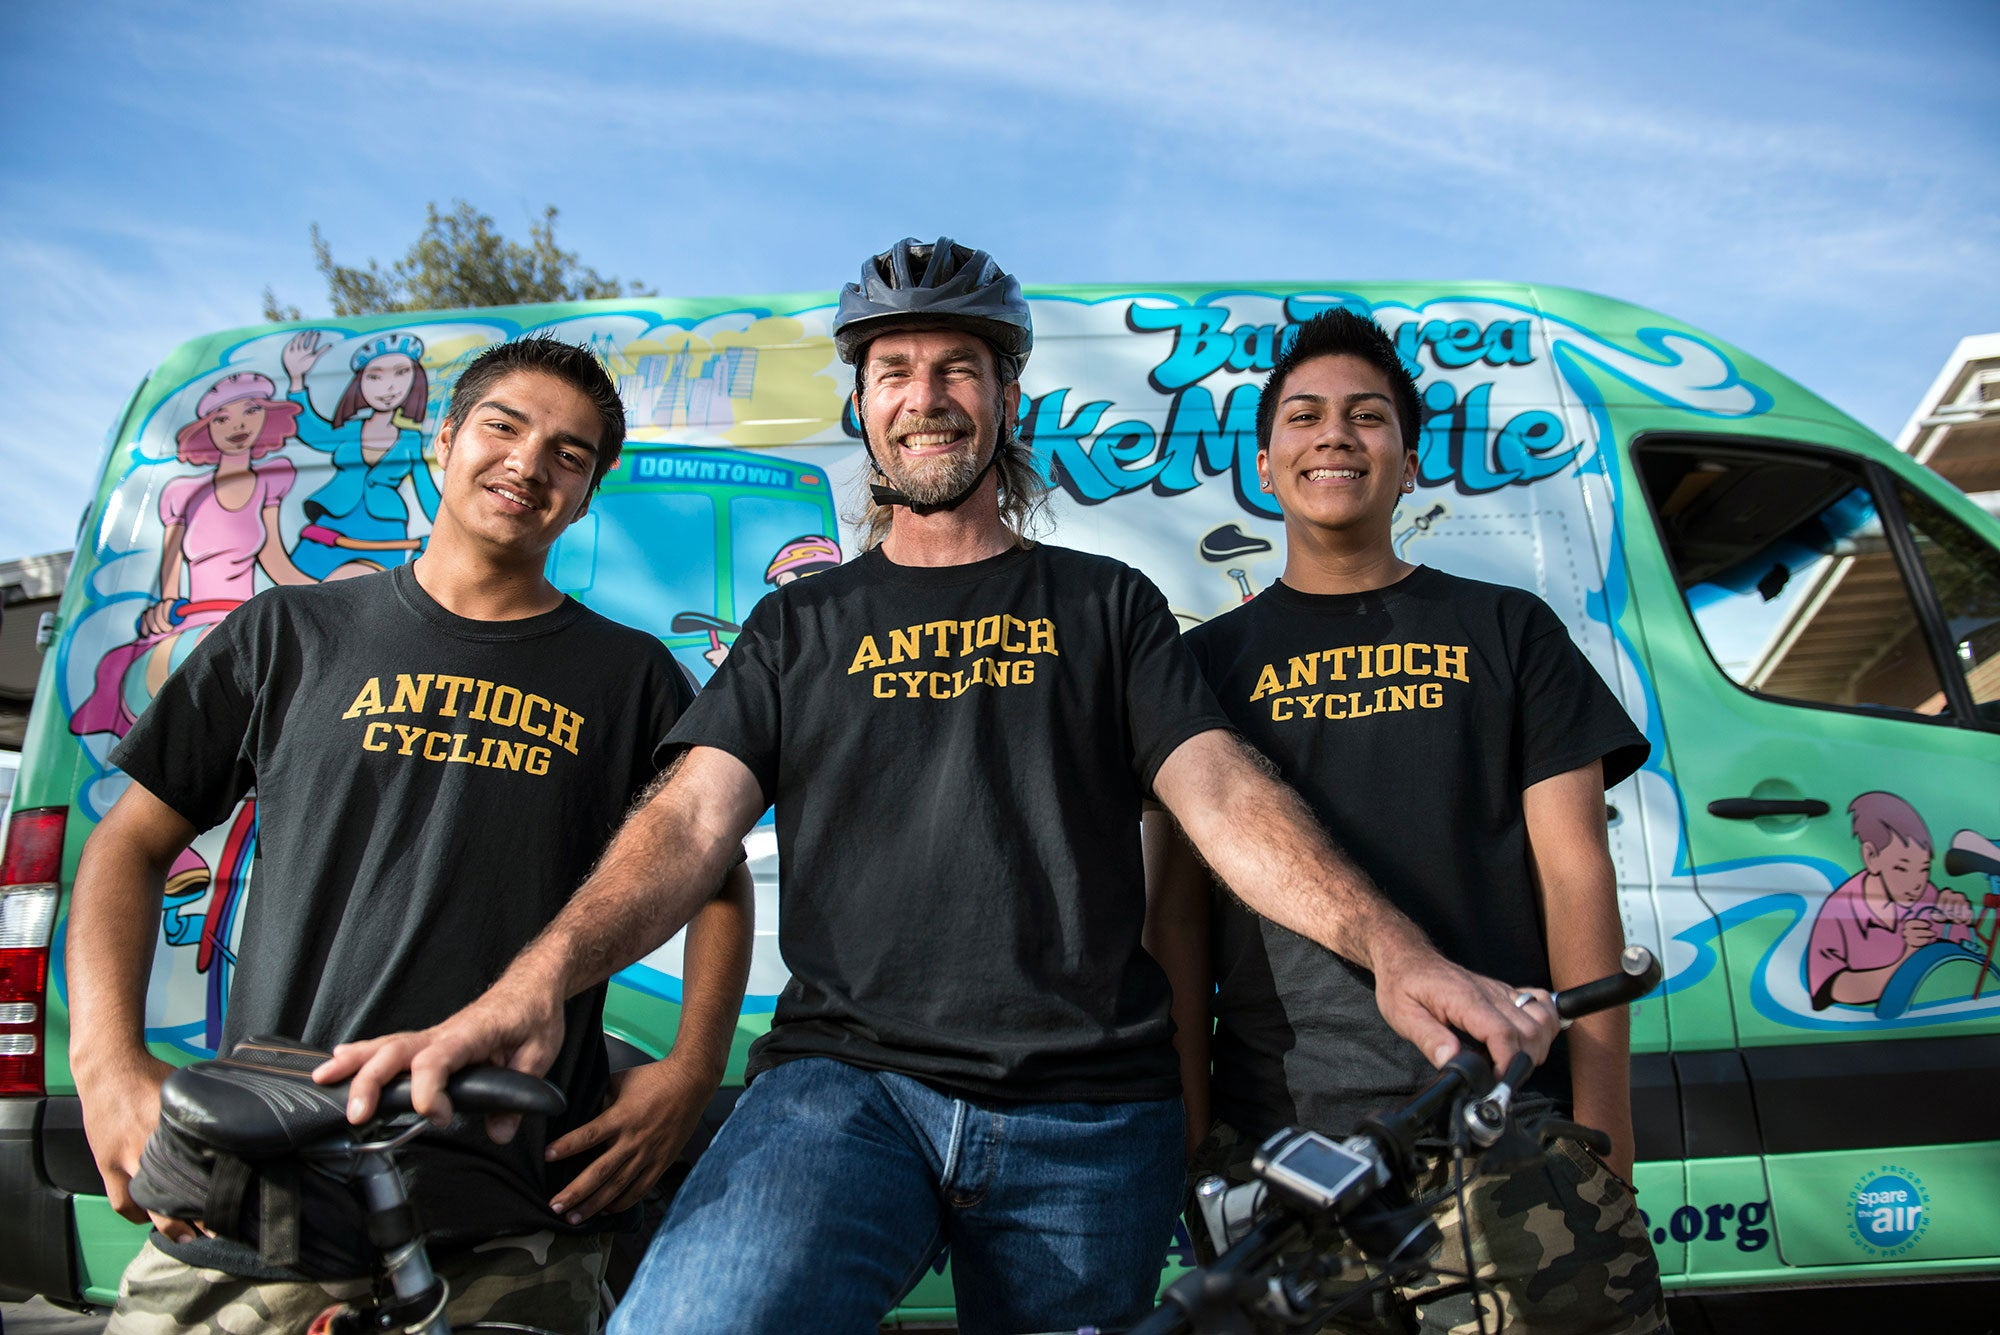 Antioch High School students on bikes